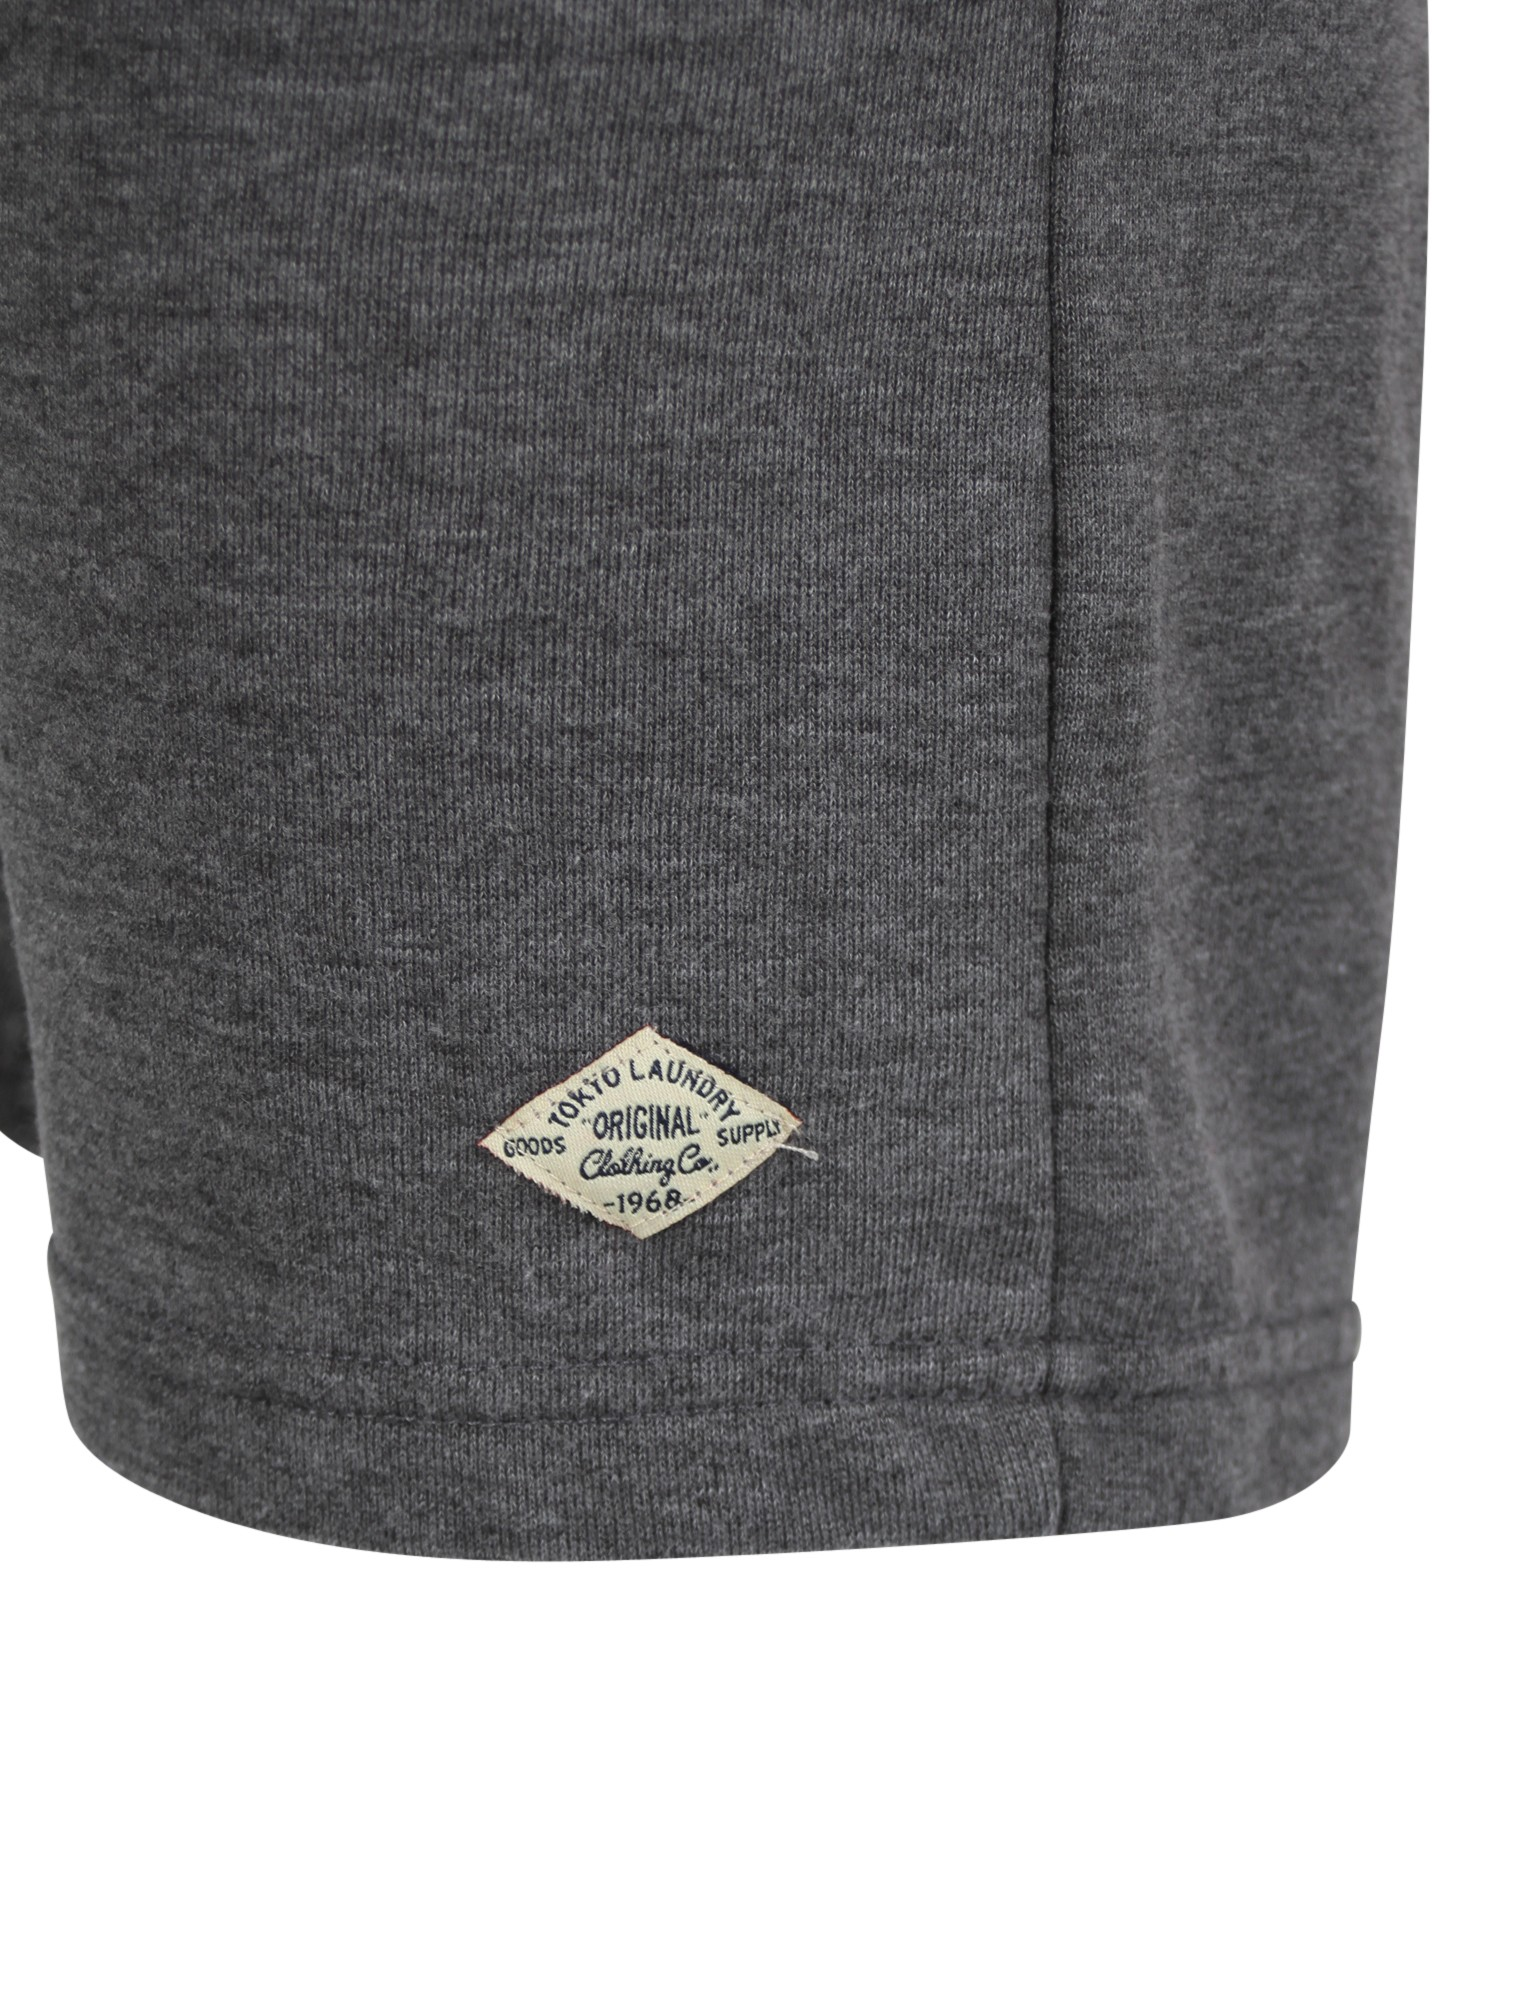 be15e522c2ea6 New Mens Tokyo Laundry Cotton Blend Drawstring Sweat Jogger Shorts ...